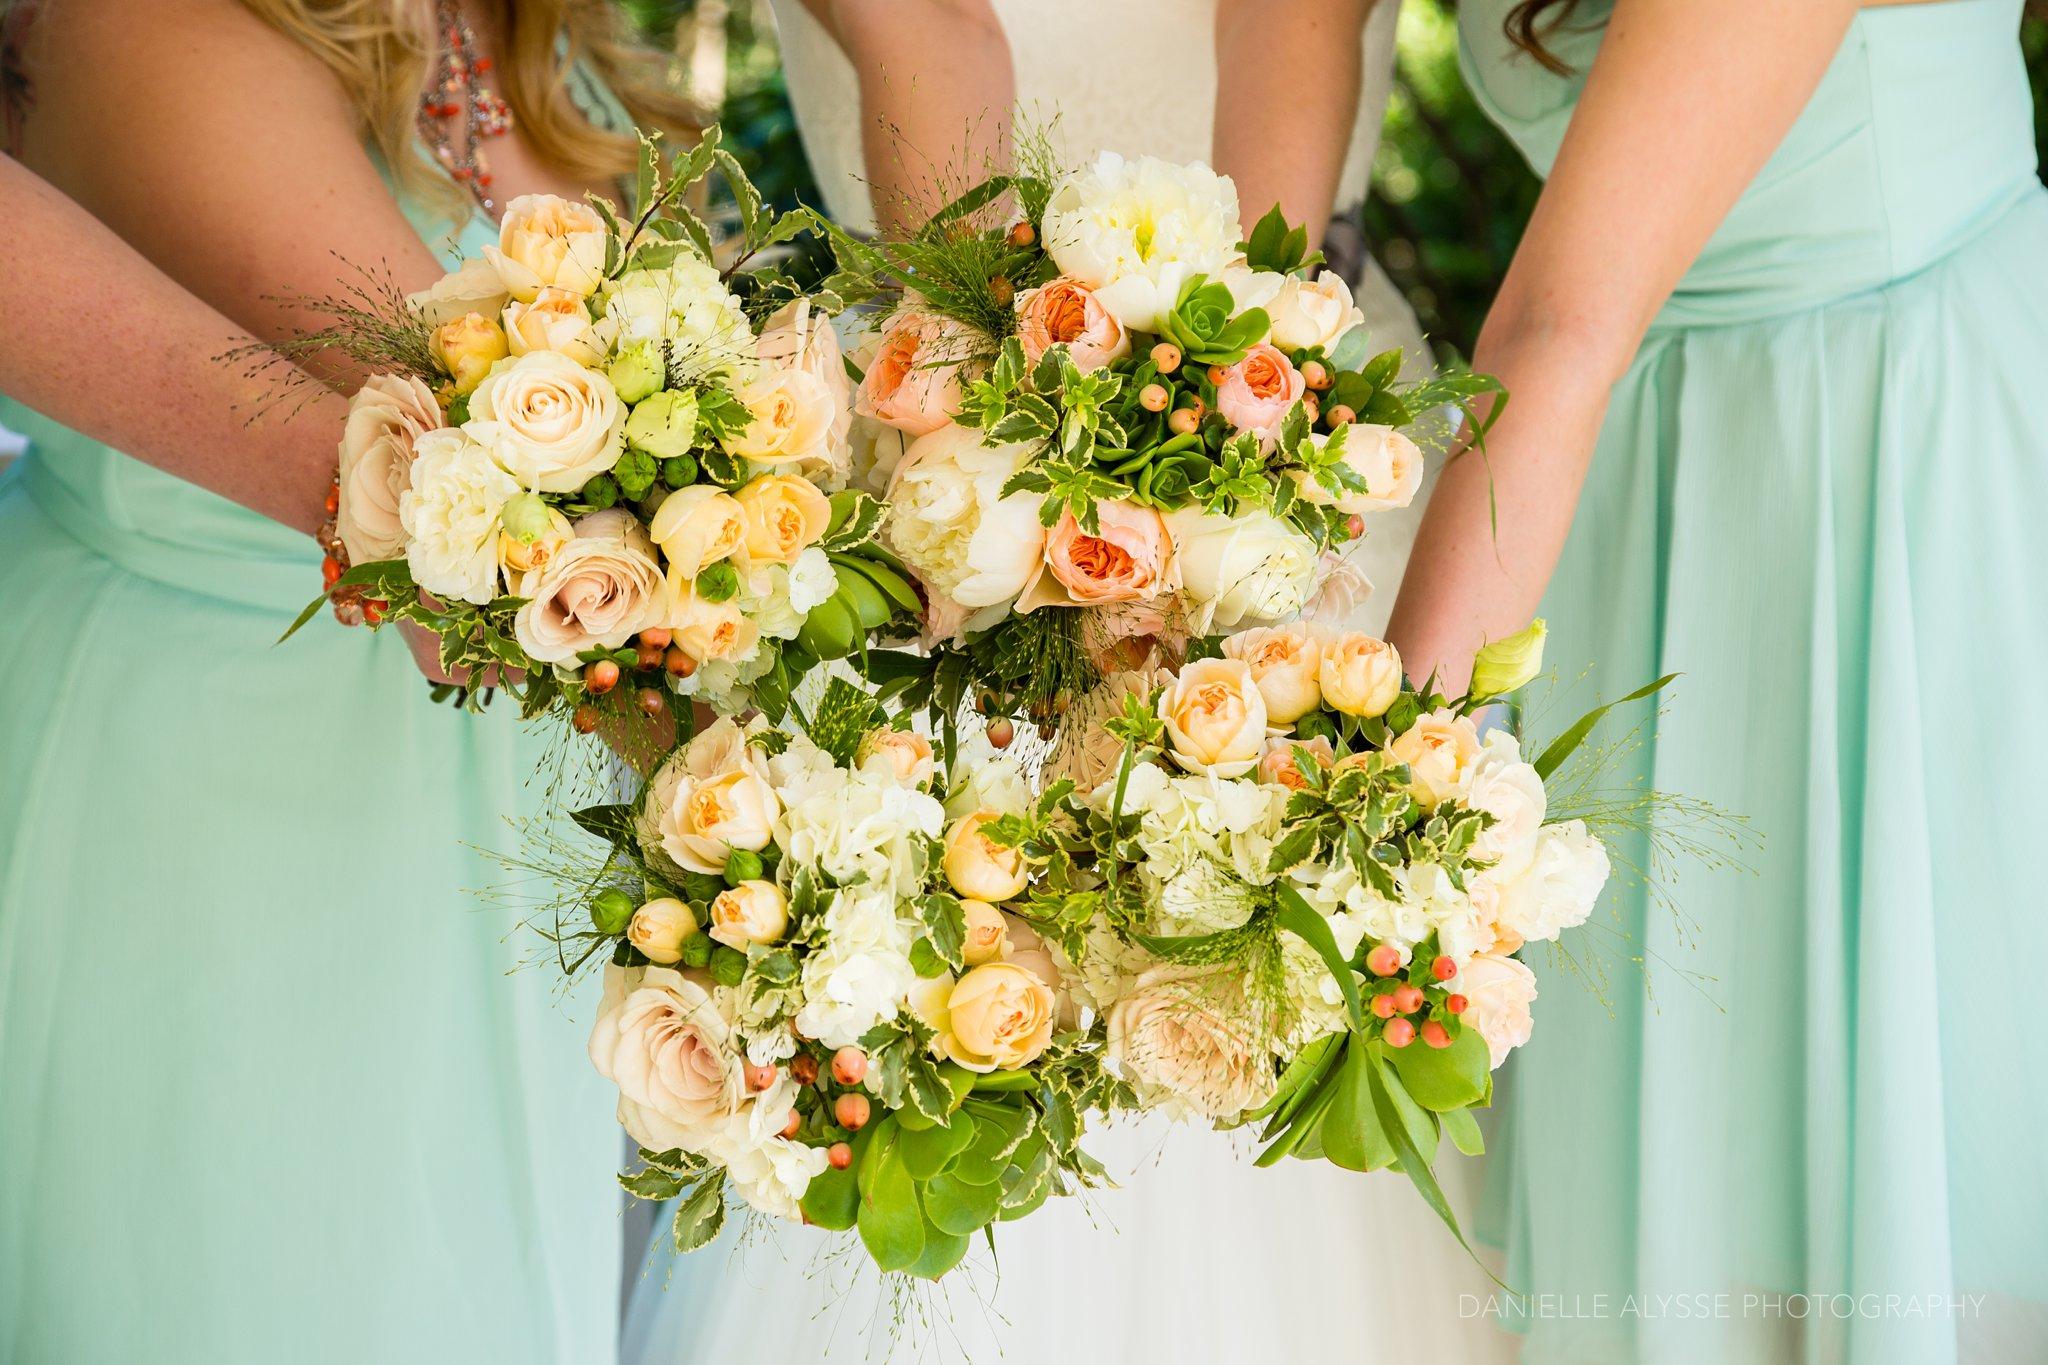 170507_blog_megan_david_wedding_loomis_flower_farm_inn_danielle_alysse_photography_sacramento_photographer0248_WEB.jpg